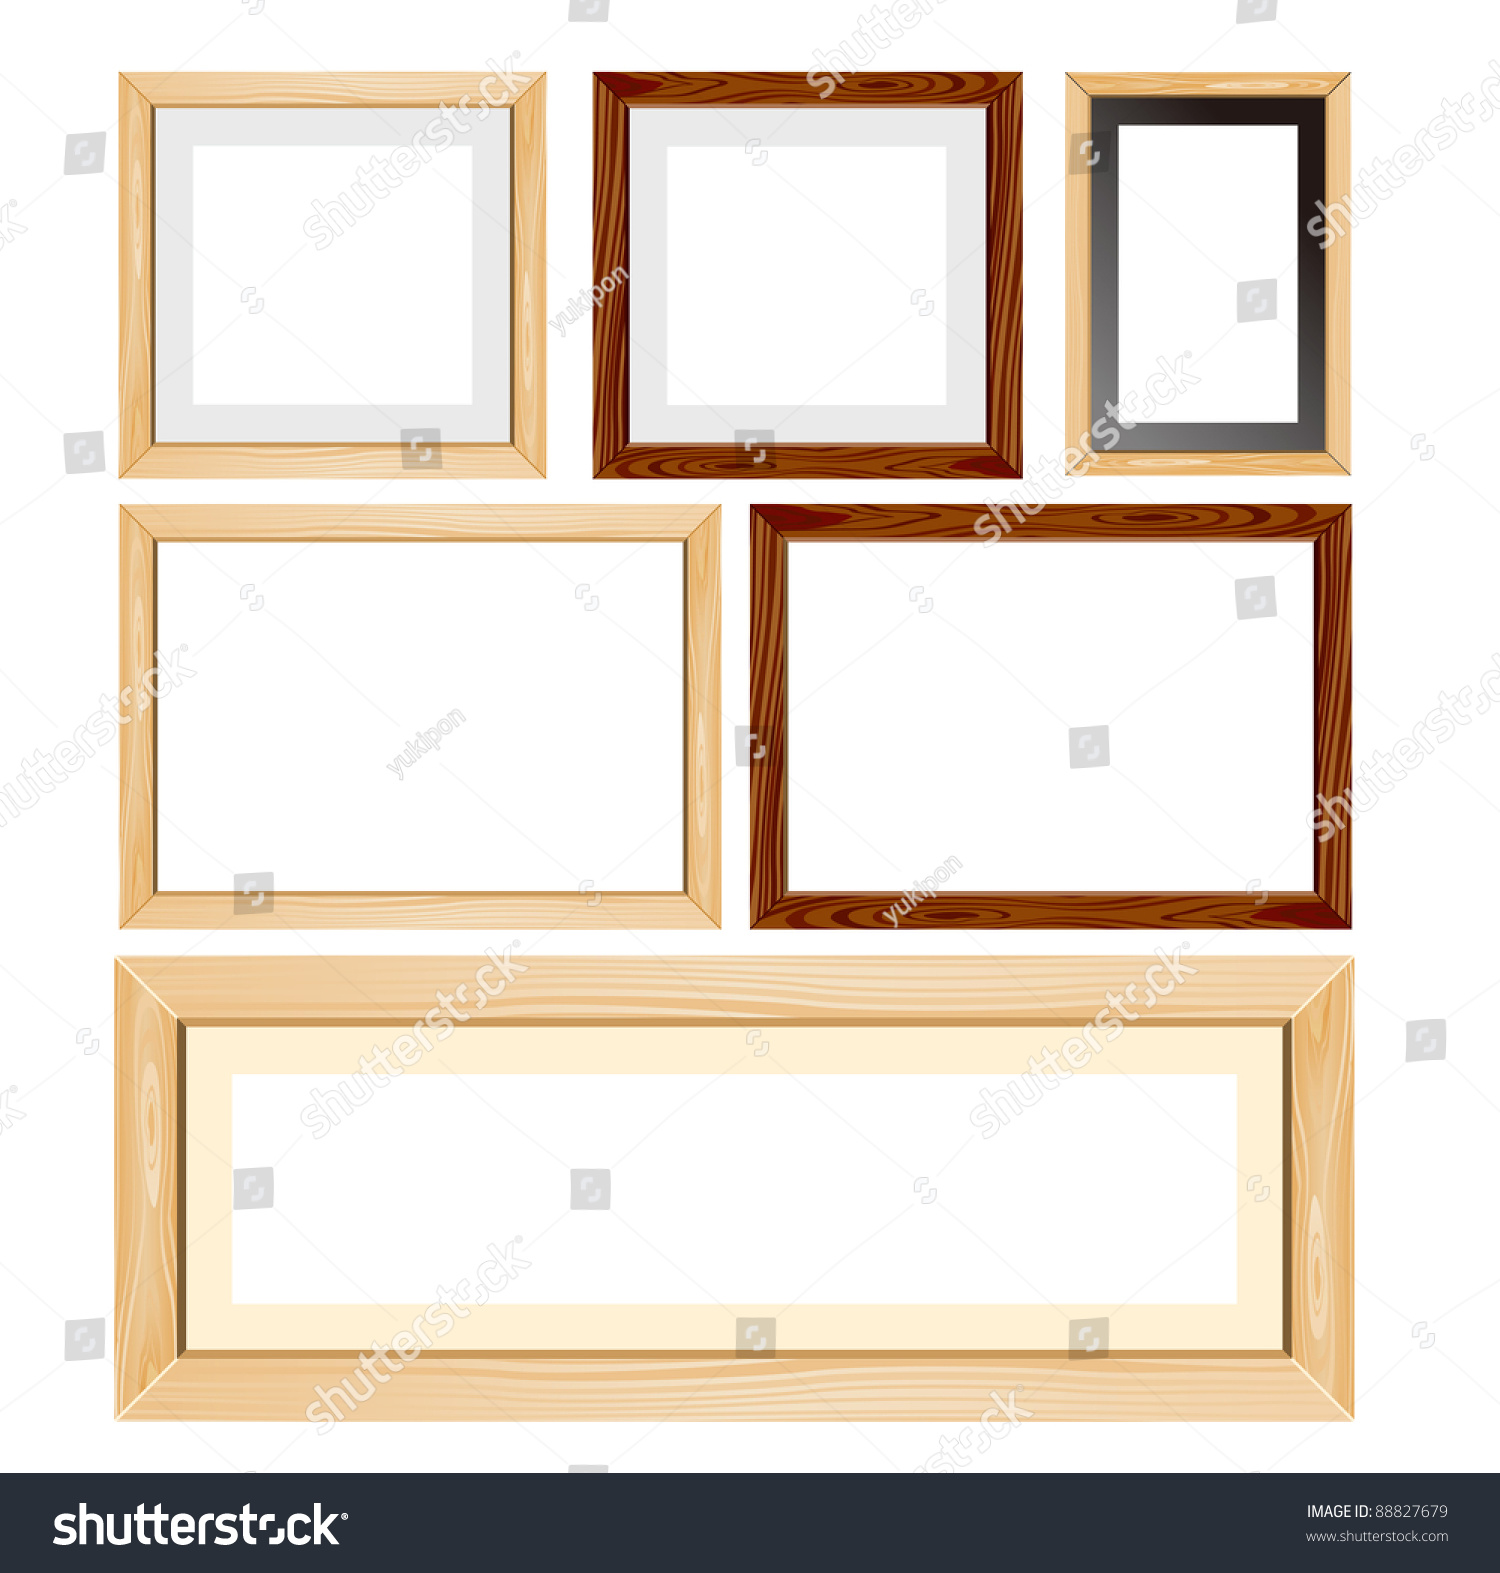 Unfinished Wood Frames Set Vector Stock Vector 88827679 - Shutterstock